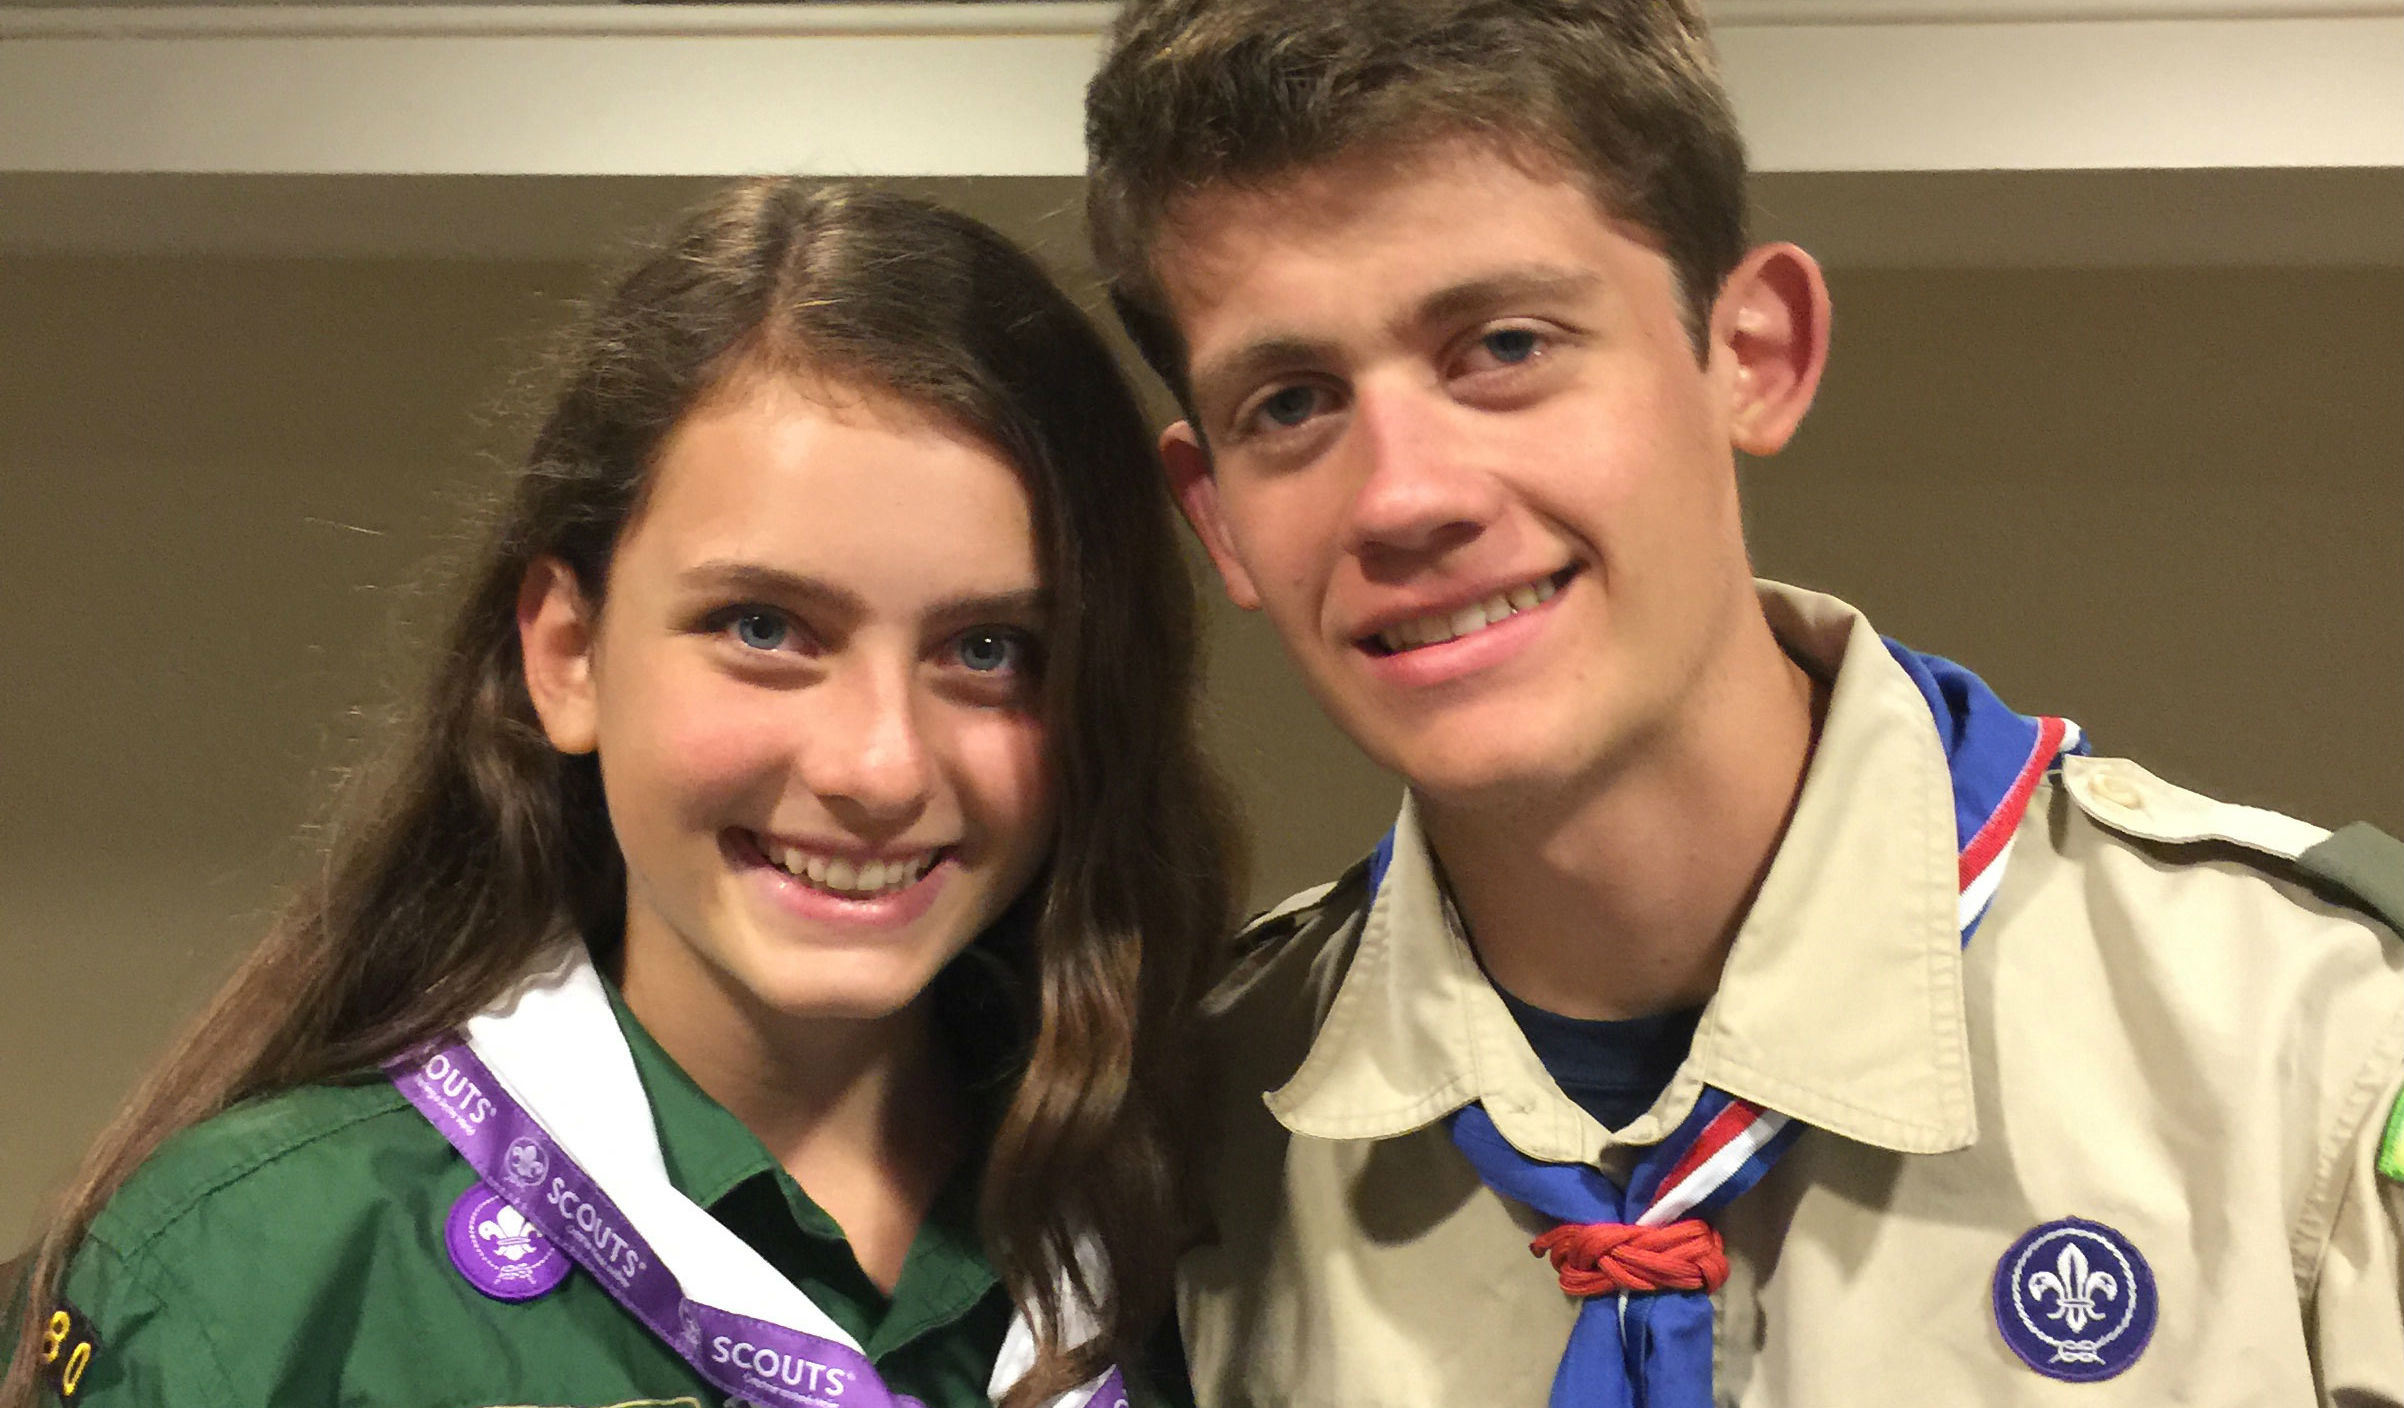 boy-scouts-girls_carr-2_239742